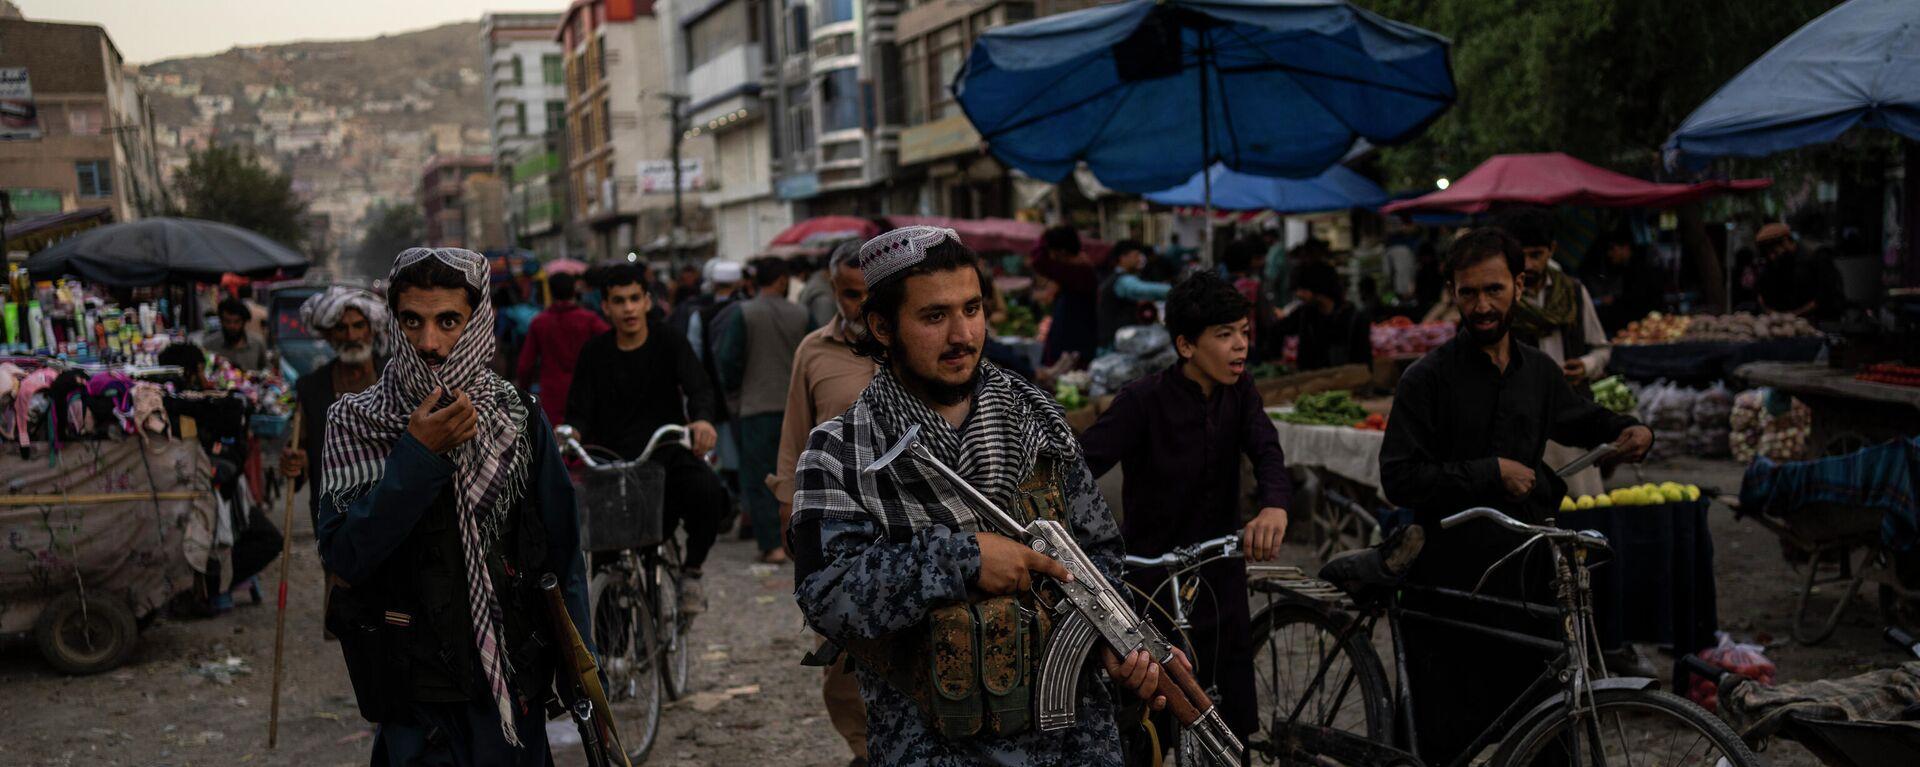 Представители талибана обходят рынок в Кабуле, Афганистан - Sputnik Грузия, 1920, 23.09.2021